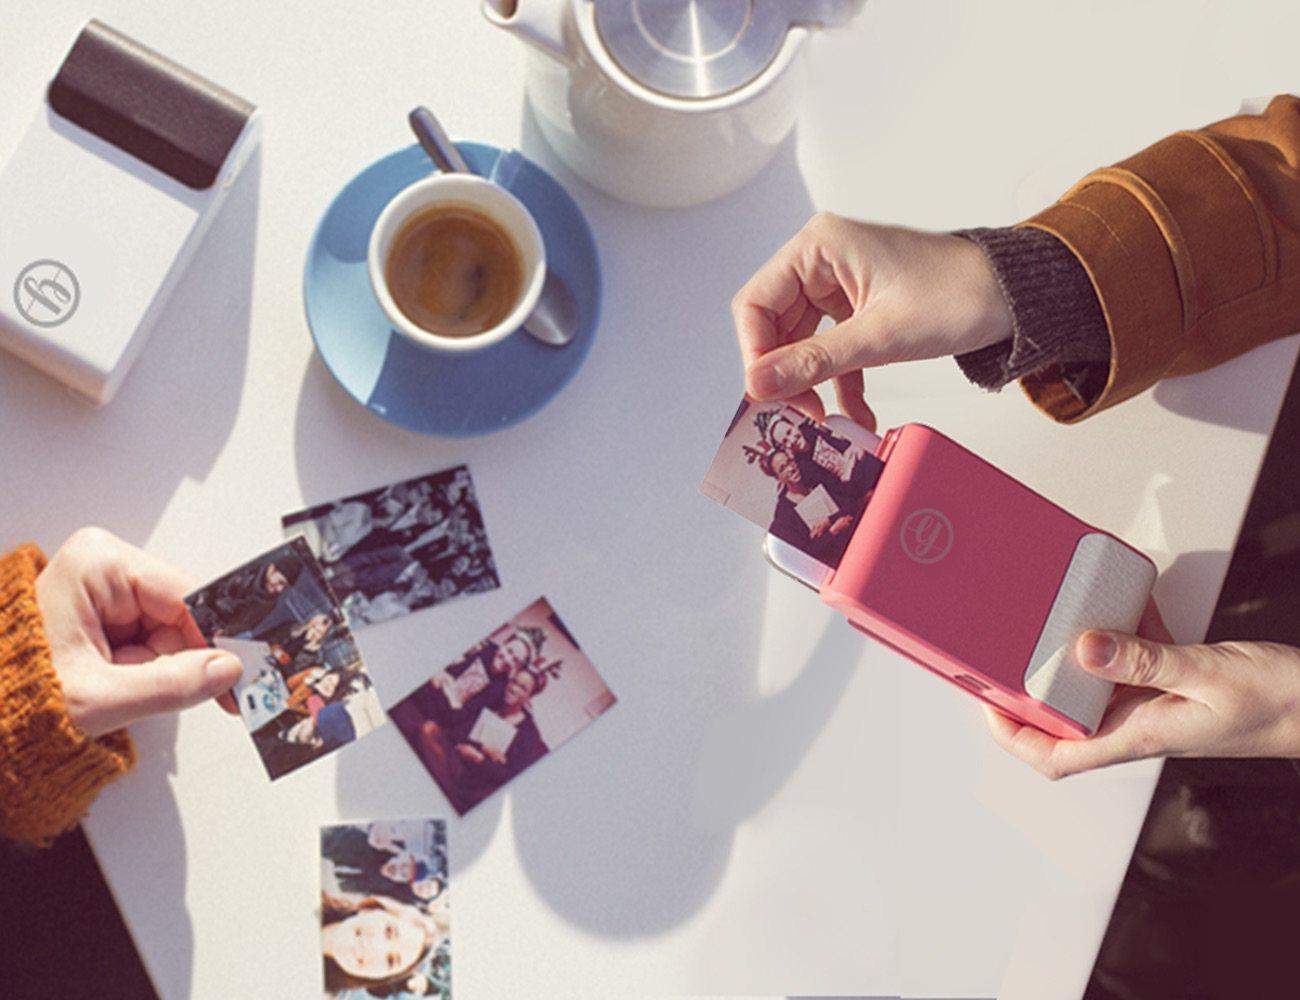 Prynt Instant Photo Printing Case